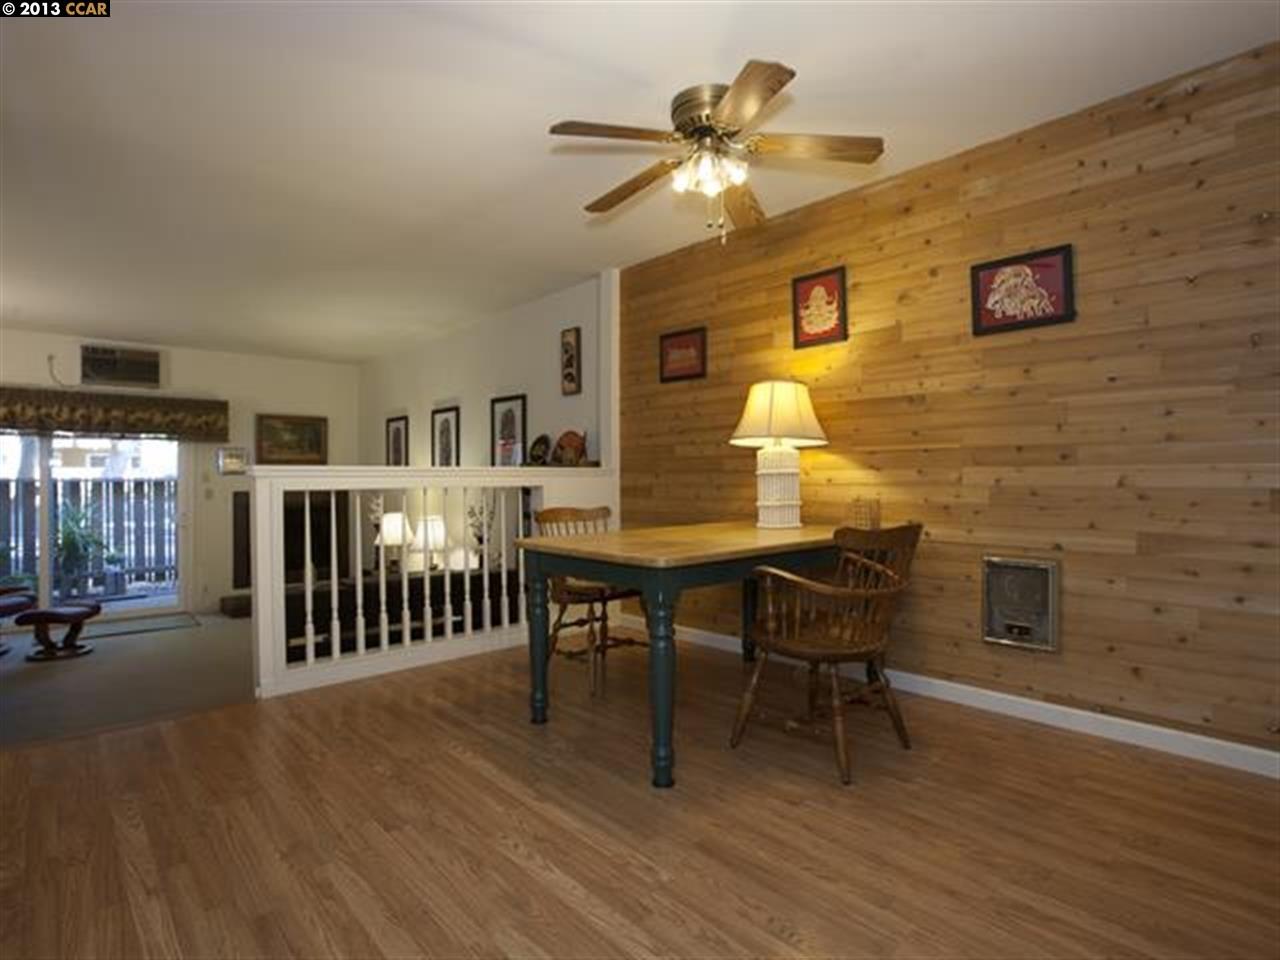 Additional photo for property listing at 8985 ALCOSTA BLVD  San Ramon, California 94583 United States